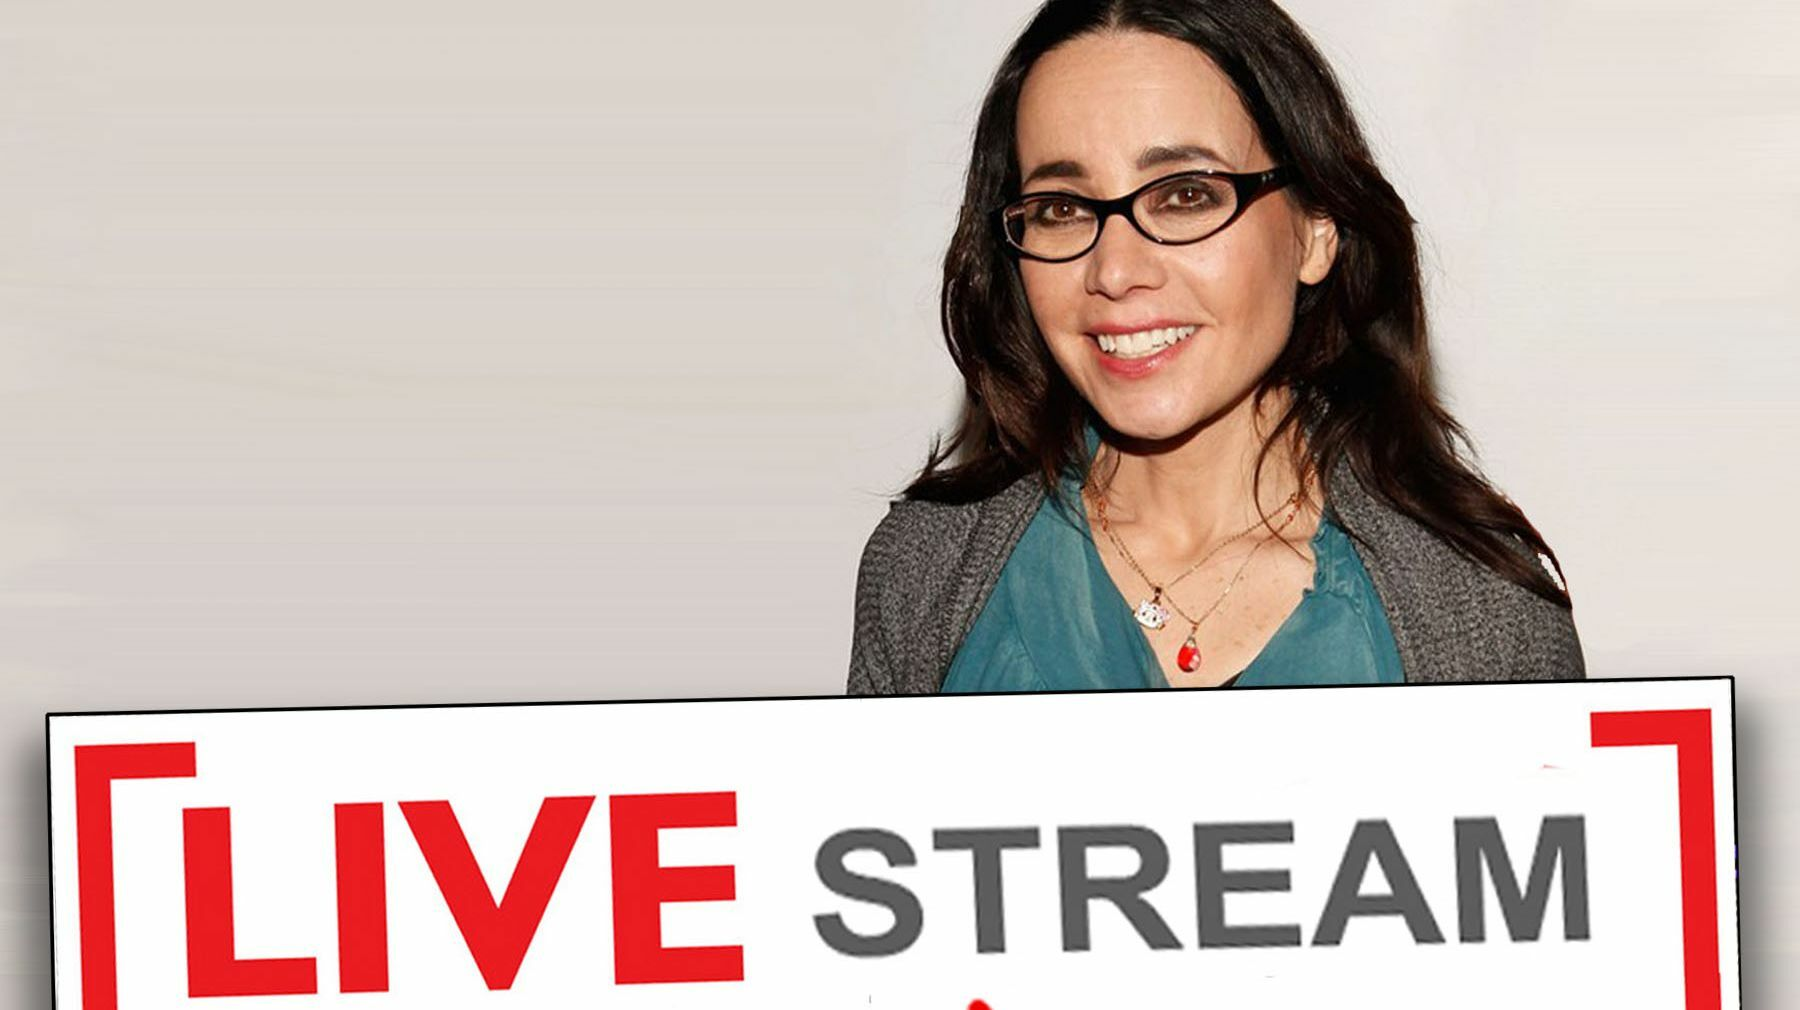 Janeane Garofalo - Standup Comedy Show Live-Stream!